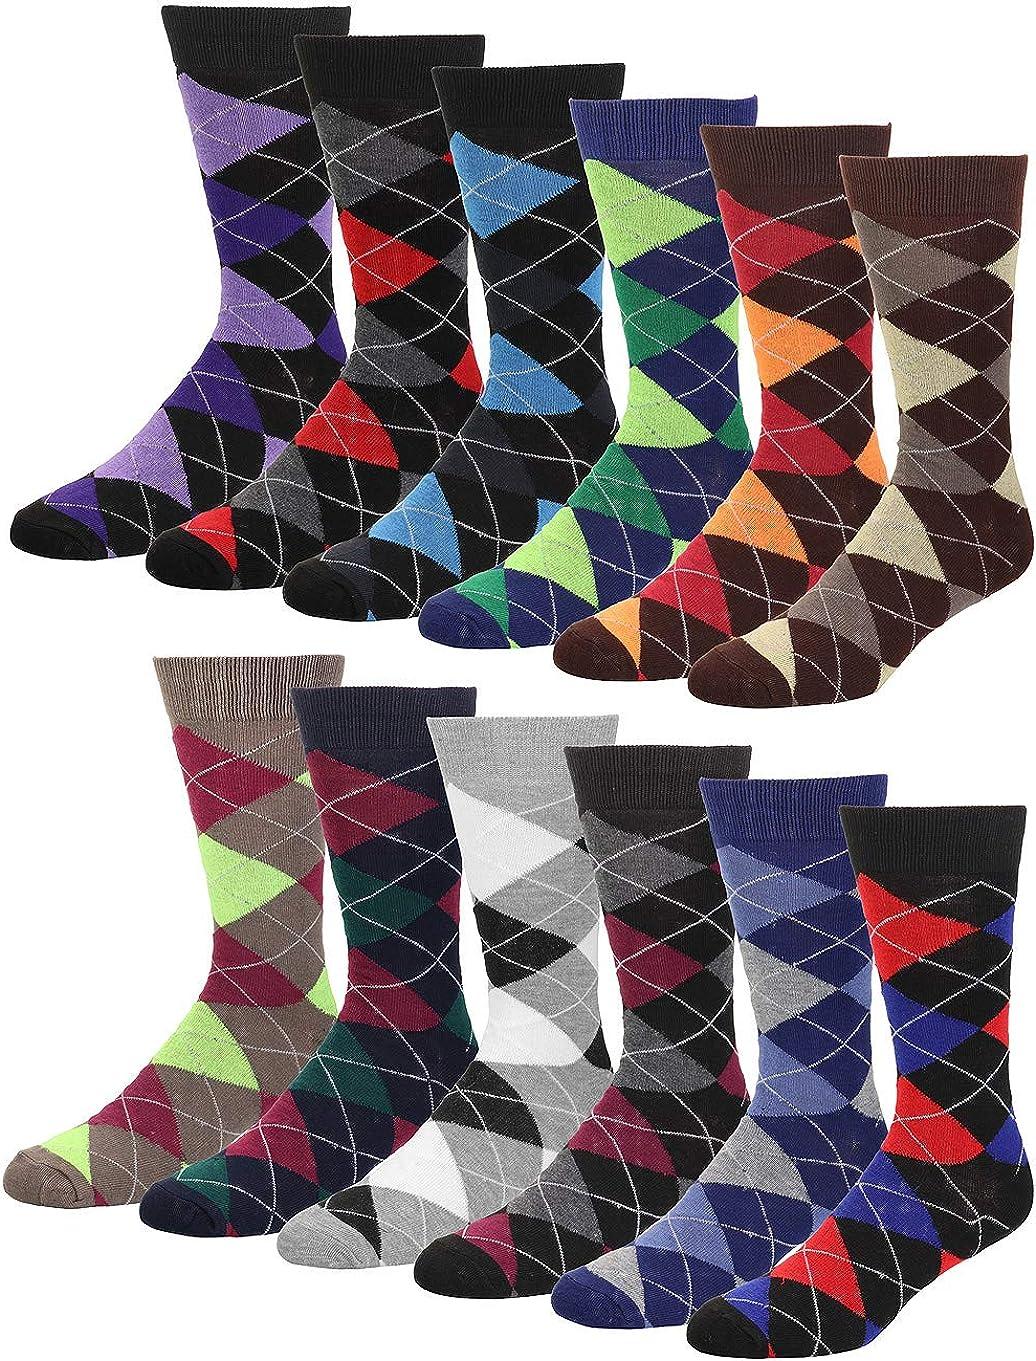 Falari Men Colorful Funny Novelty Crazy Combed Casual Dress Socks